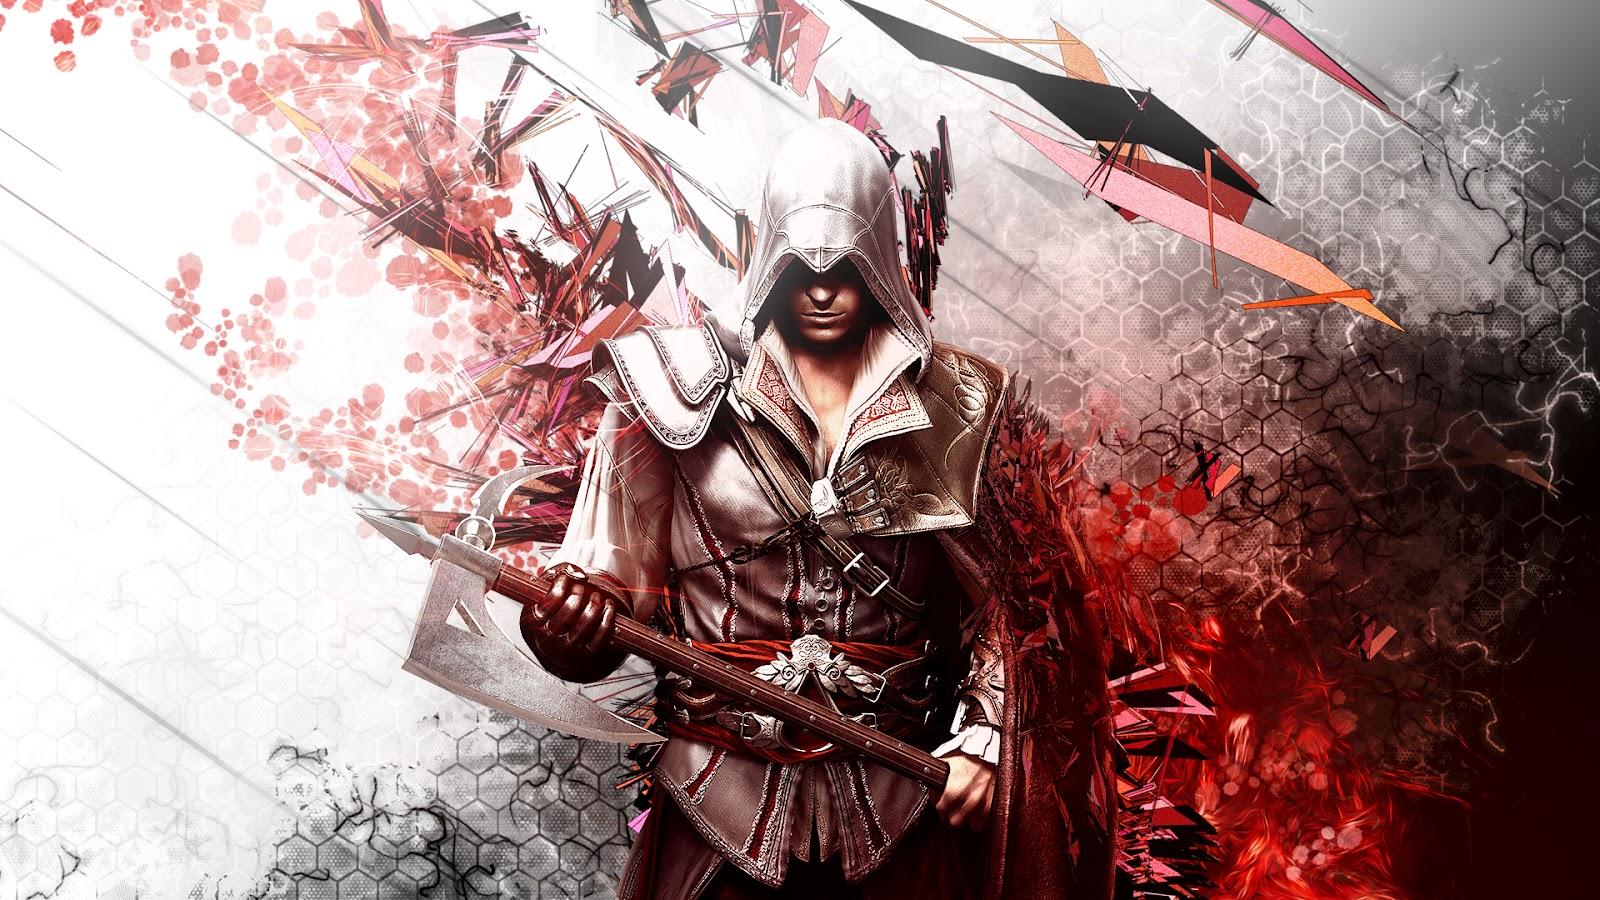 Assassin Creed 2 HD Wallpaper 1080p   HD Dock 1600x900